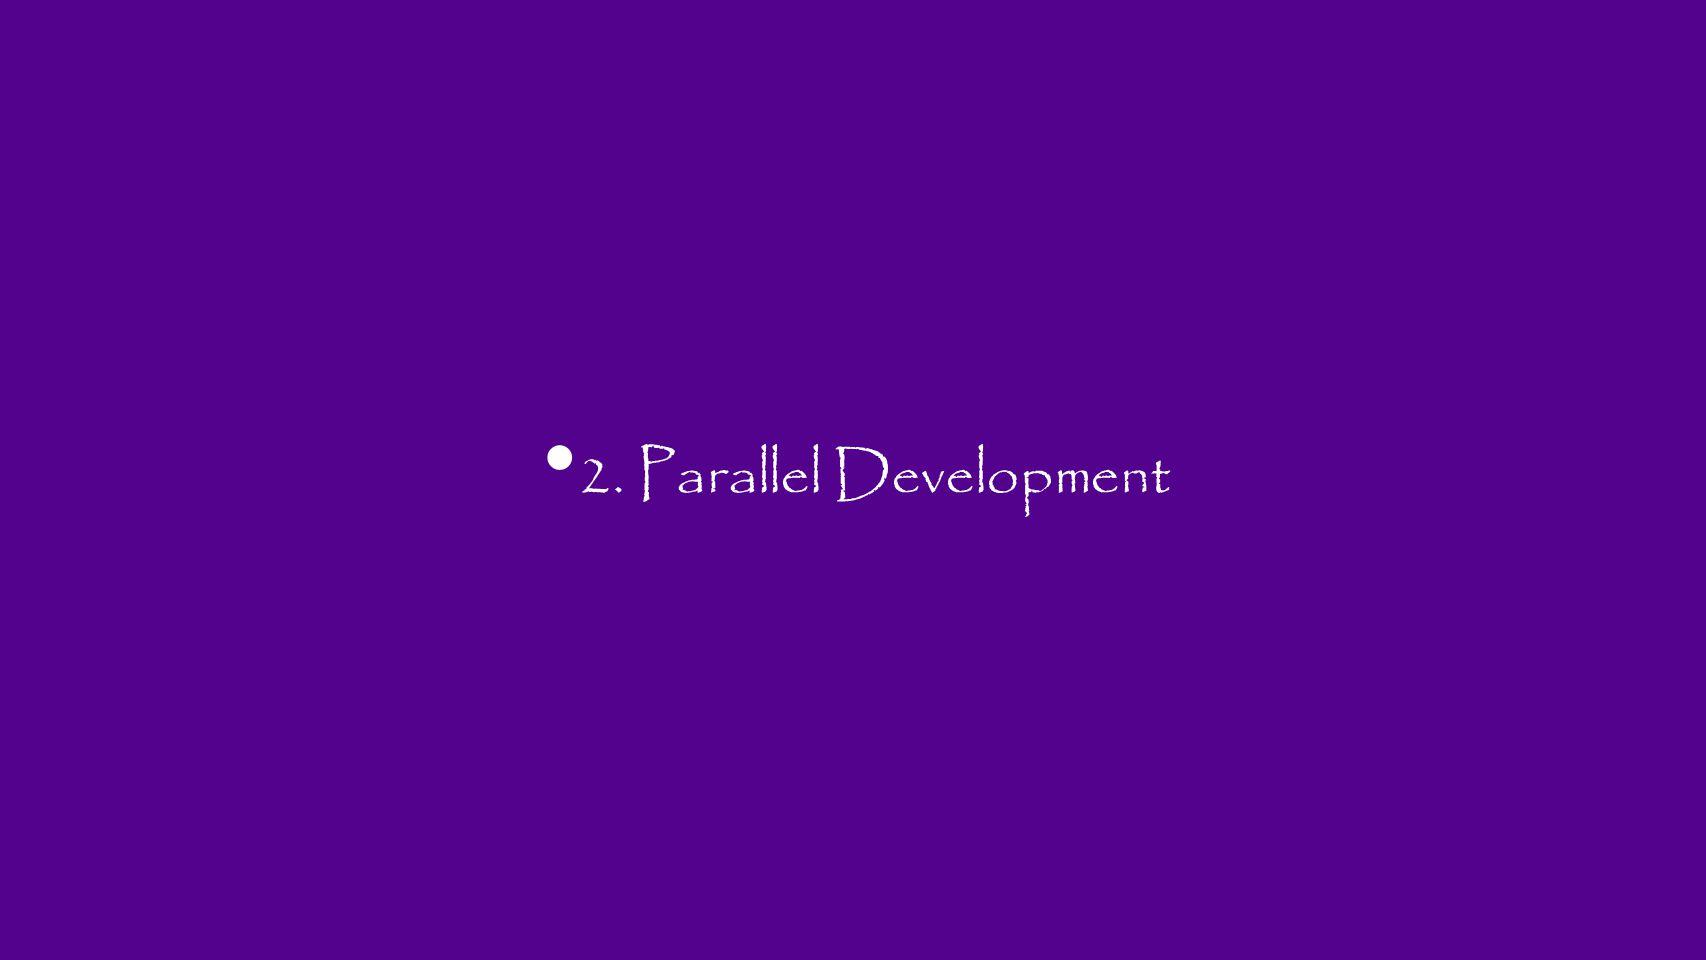 2. Parallel Development